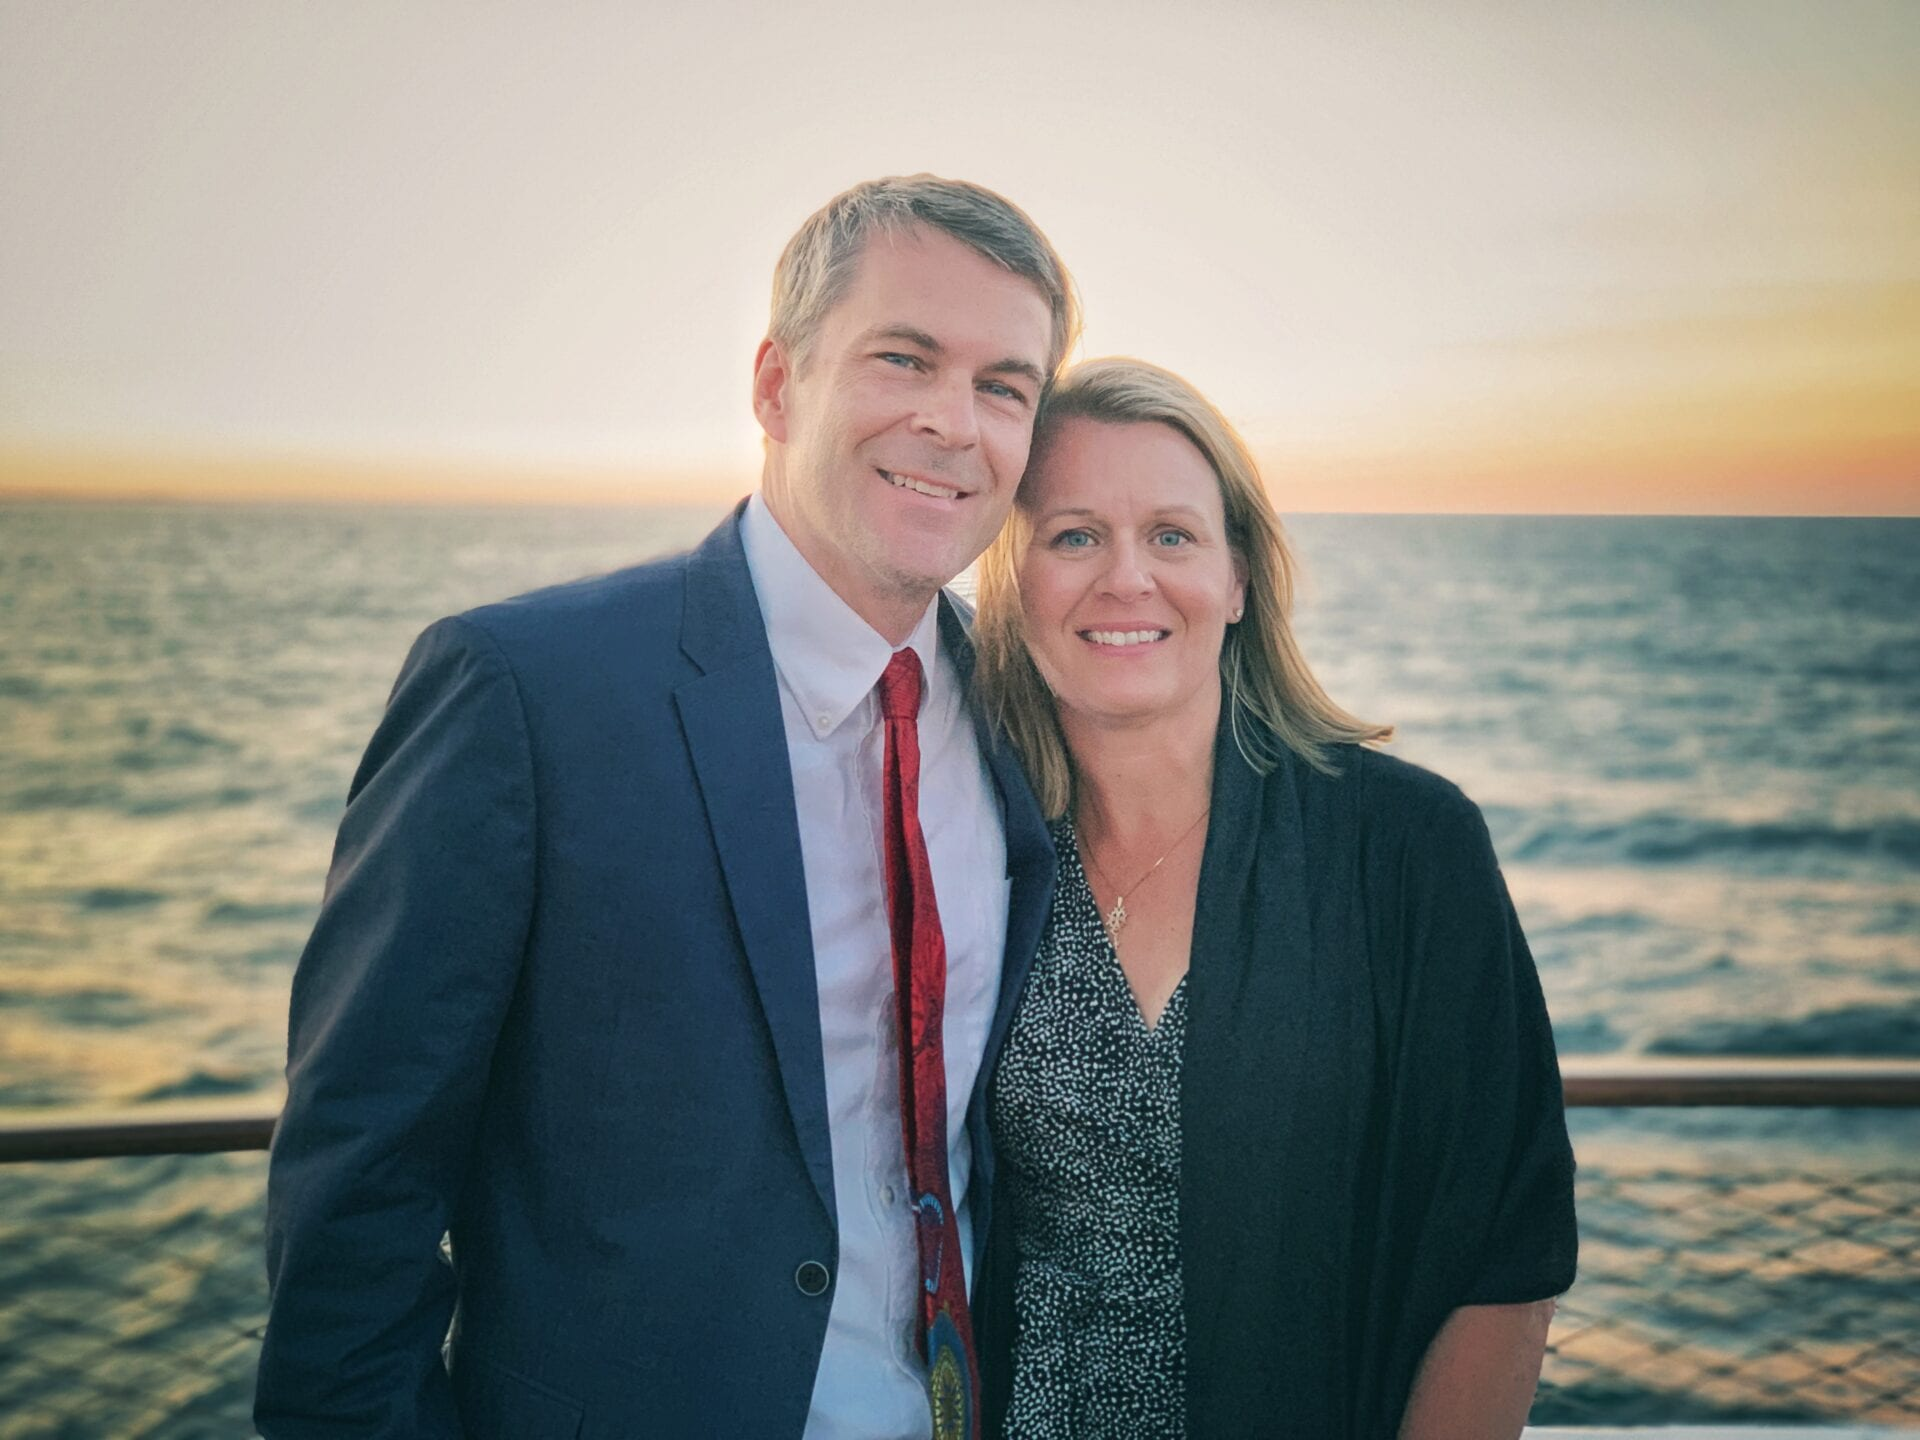 Karl & Julie Johnson, Managing Directors